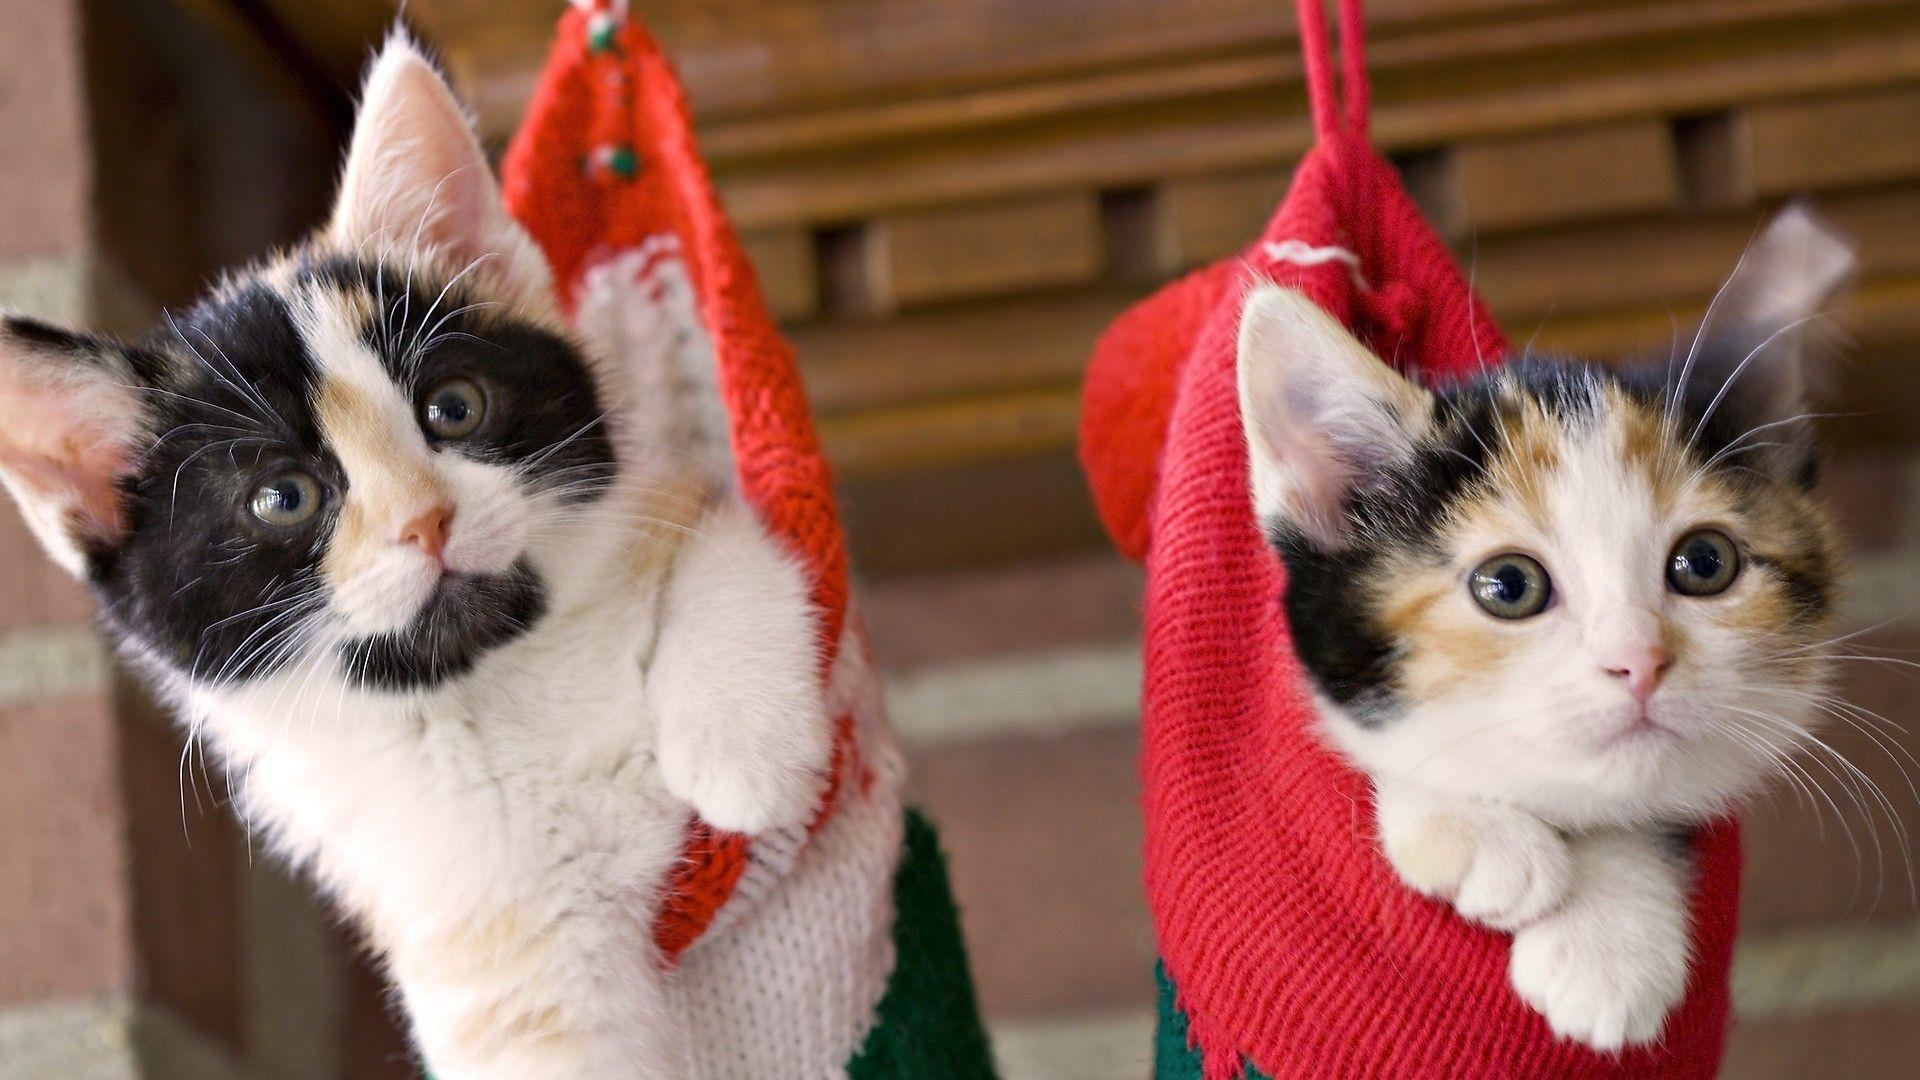 Cute Cat Wallpapers For Desktop 66 Images